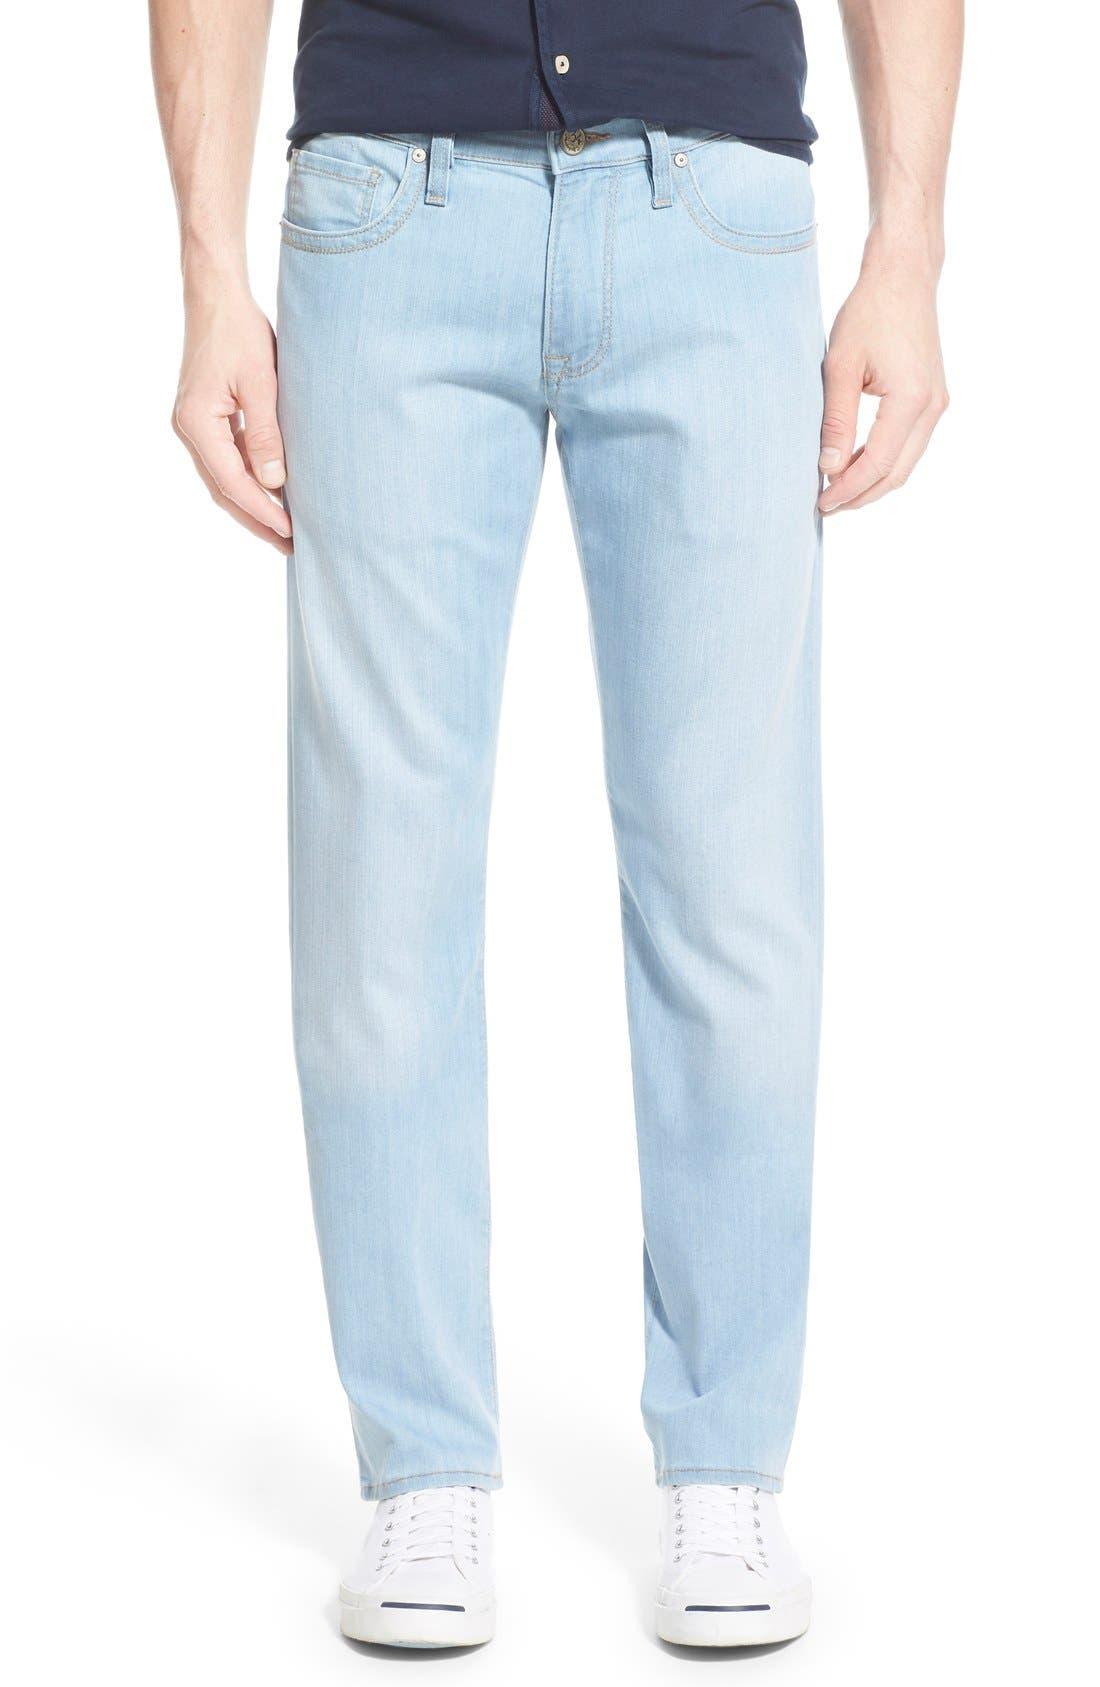 34 Heritage Courage Straight Leg Jeans (Bleach Hawaii) (Regular & Tall)